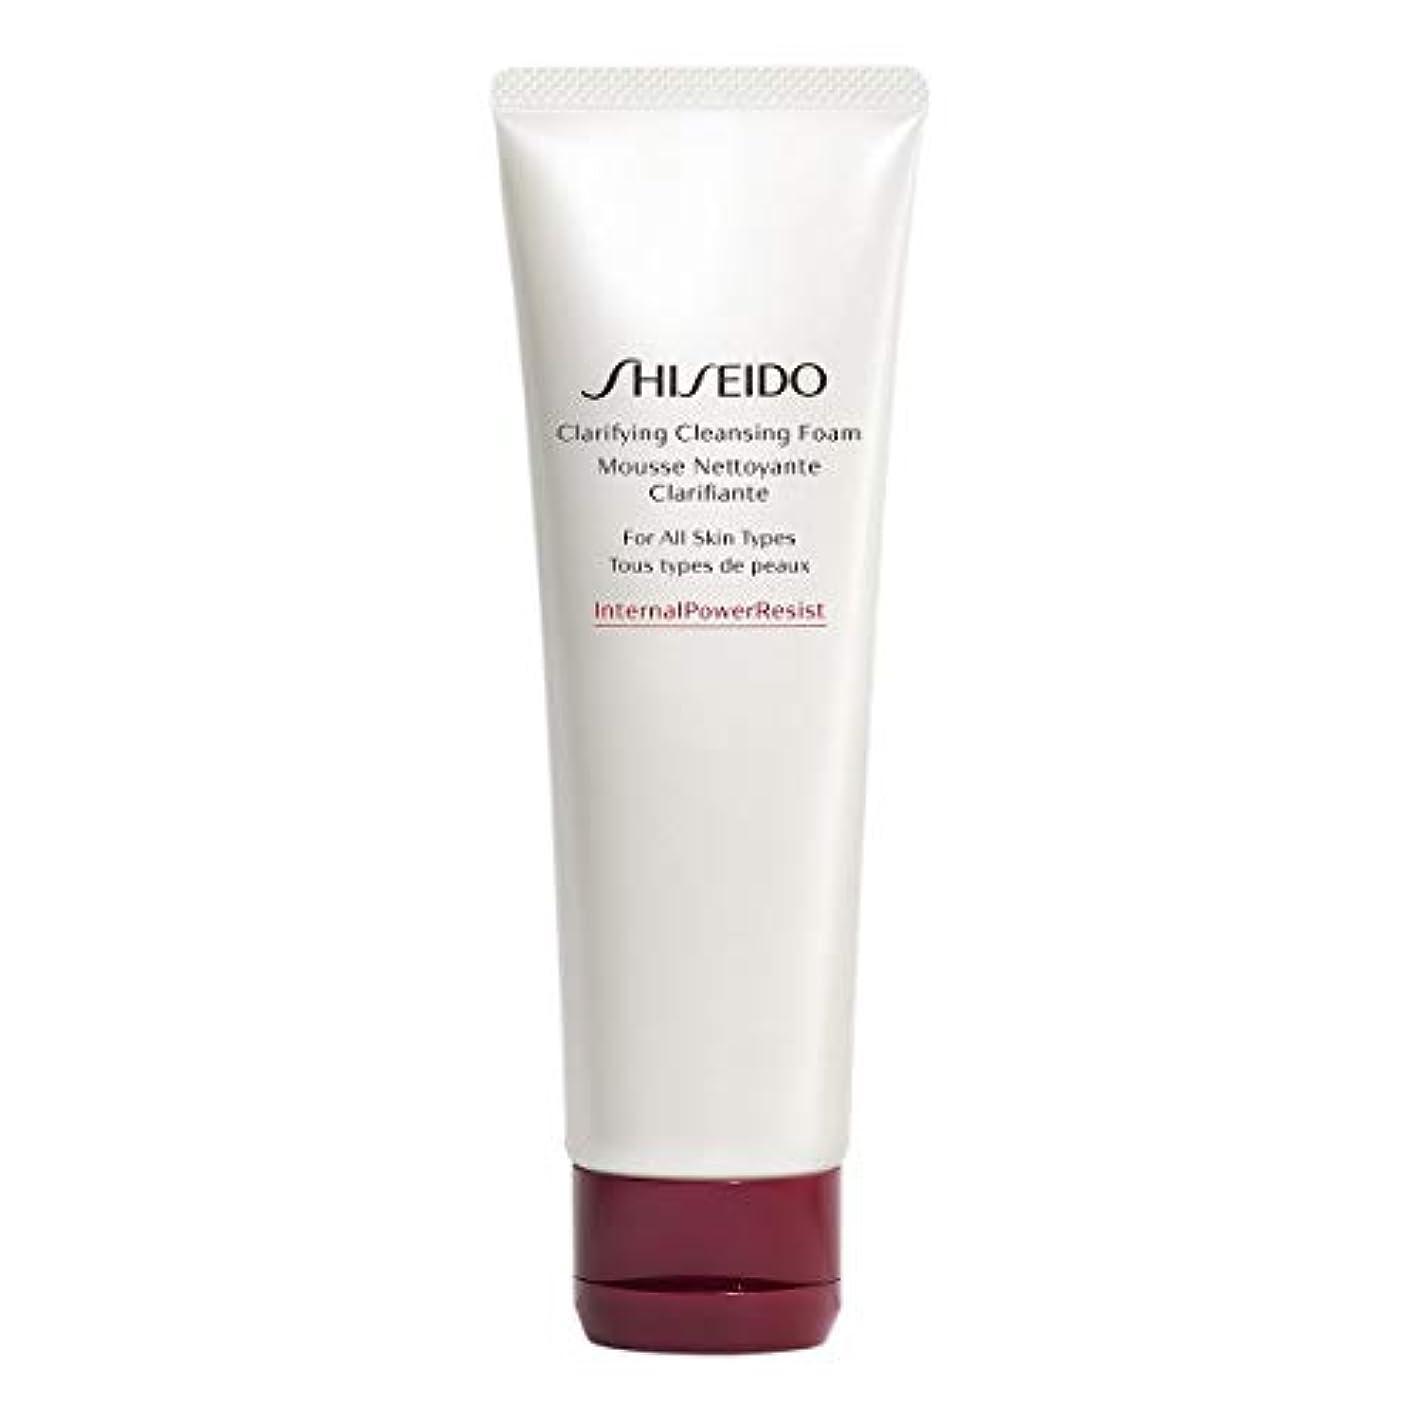 資生堂 Defend Beauty Clarifying Cleansing Foam 125ml/4.6oz並行輸入品